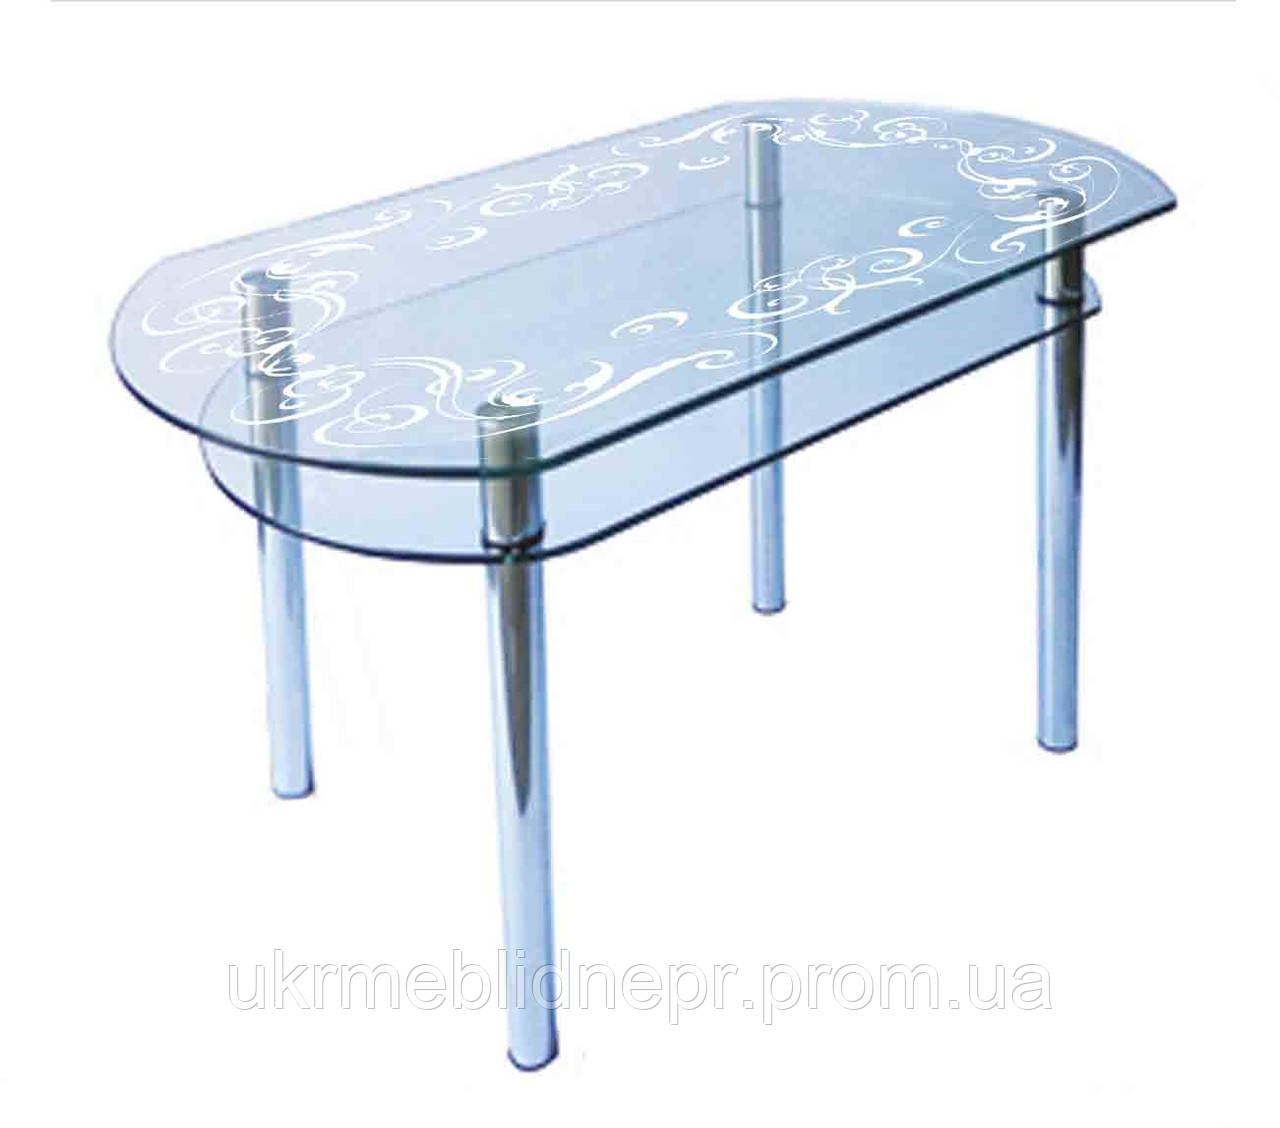 Обеденный стол КС- 5